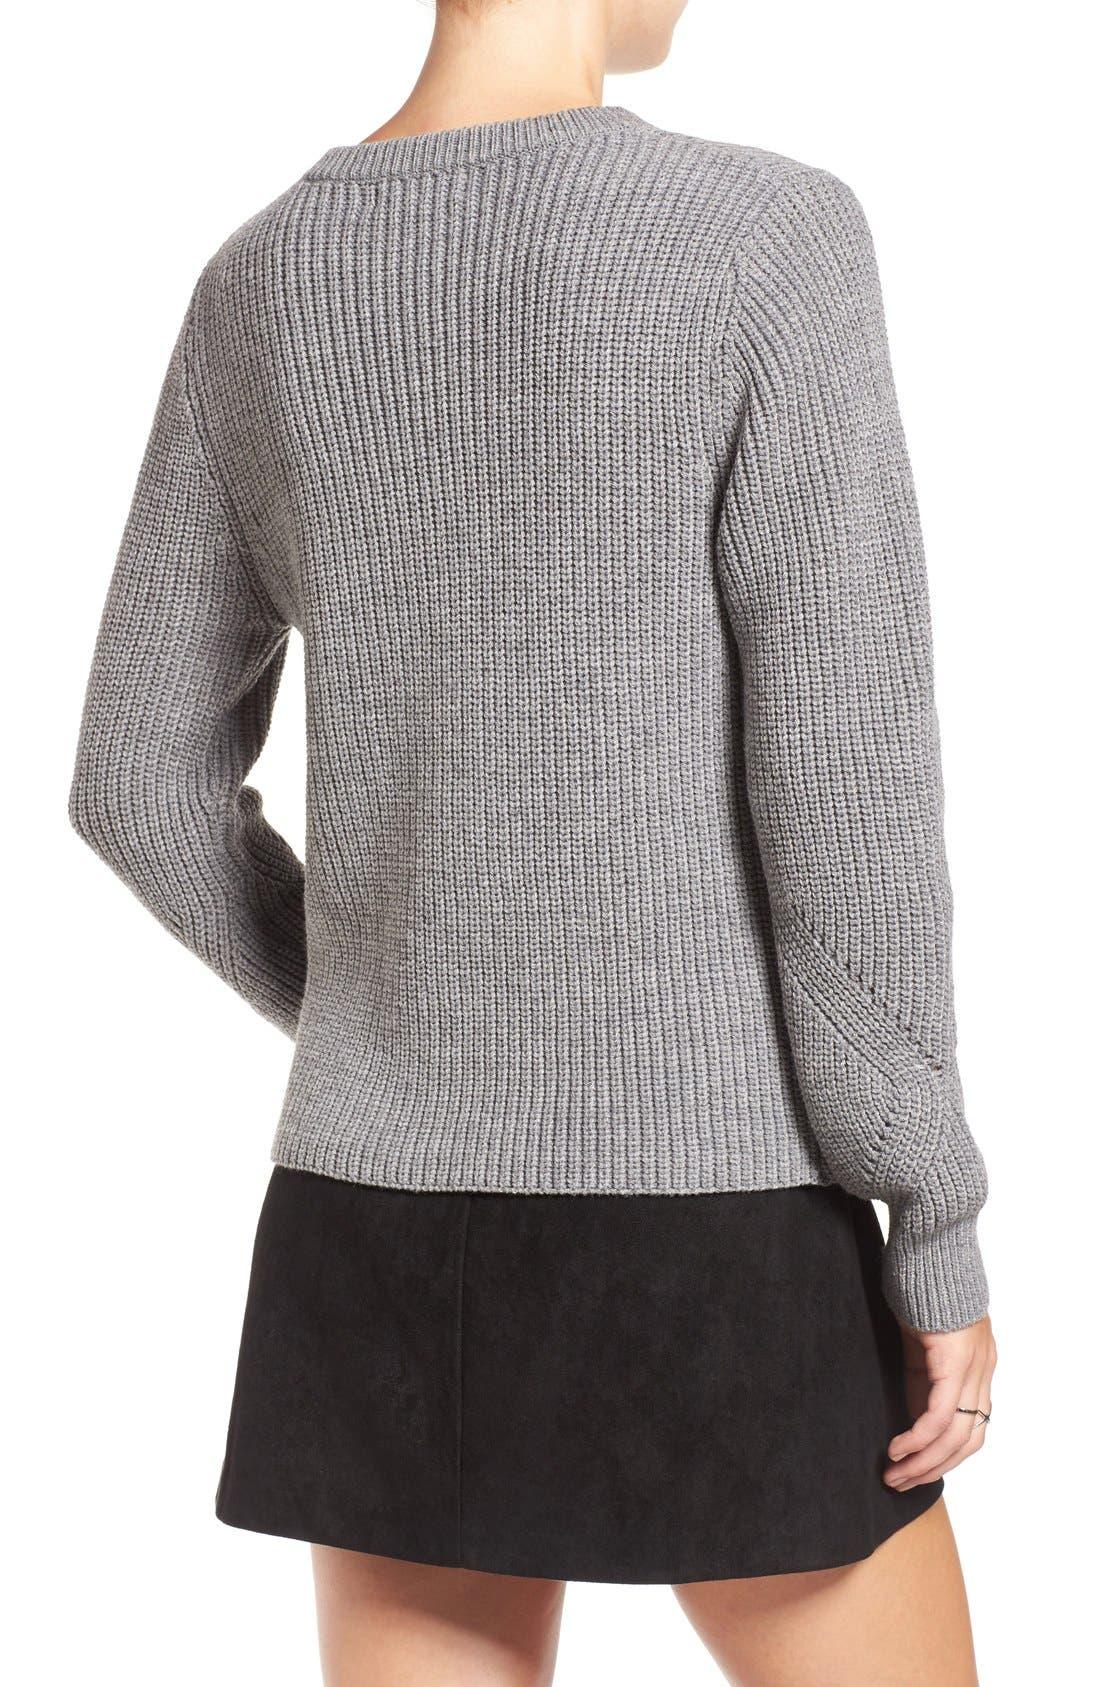 Alternate Image 2  - Elodie Rib Knit Lace-Up Sweater